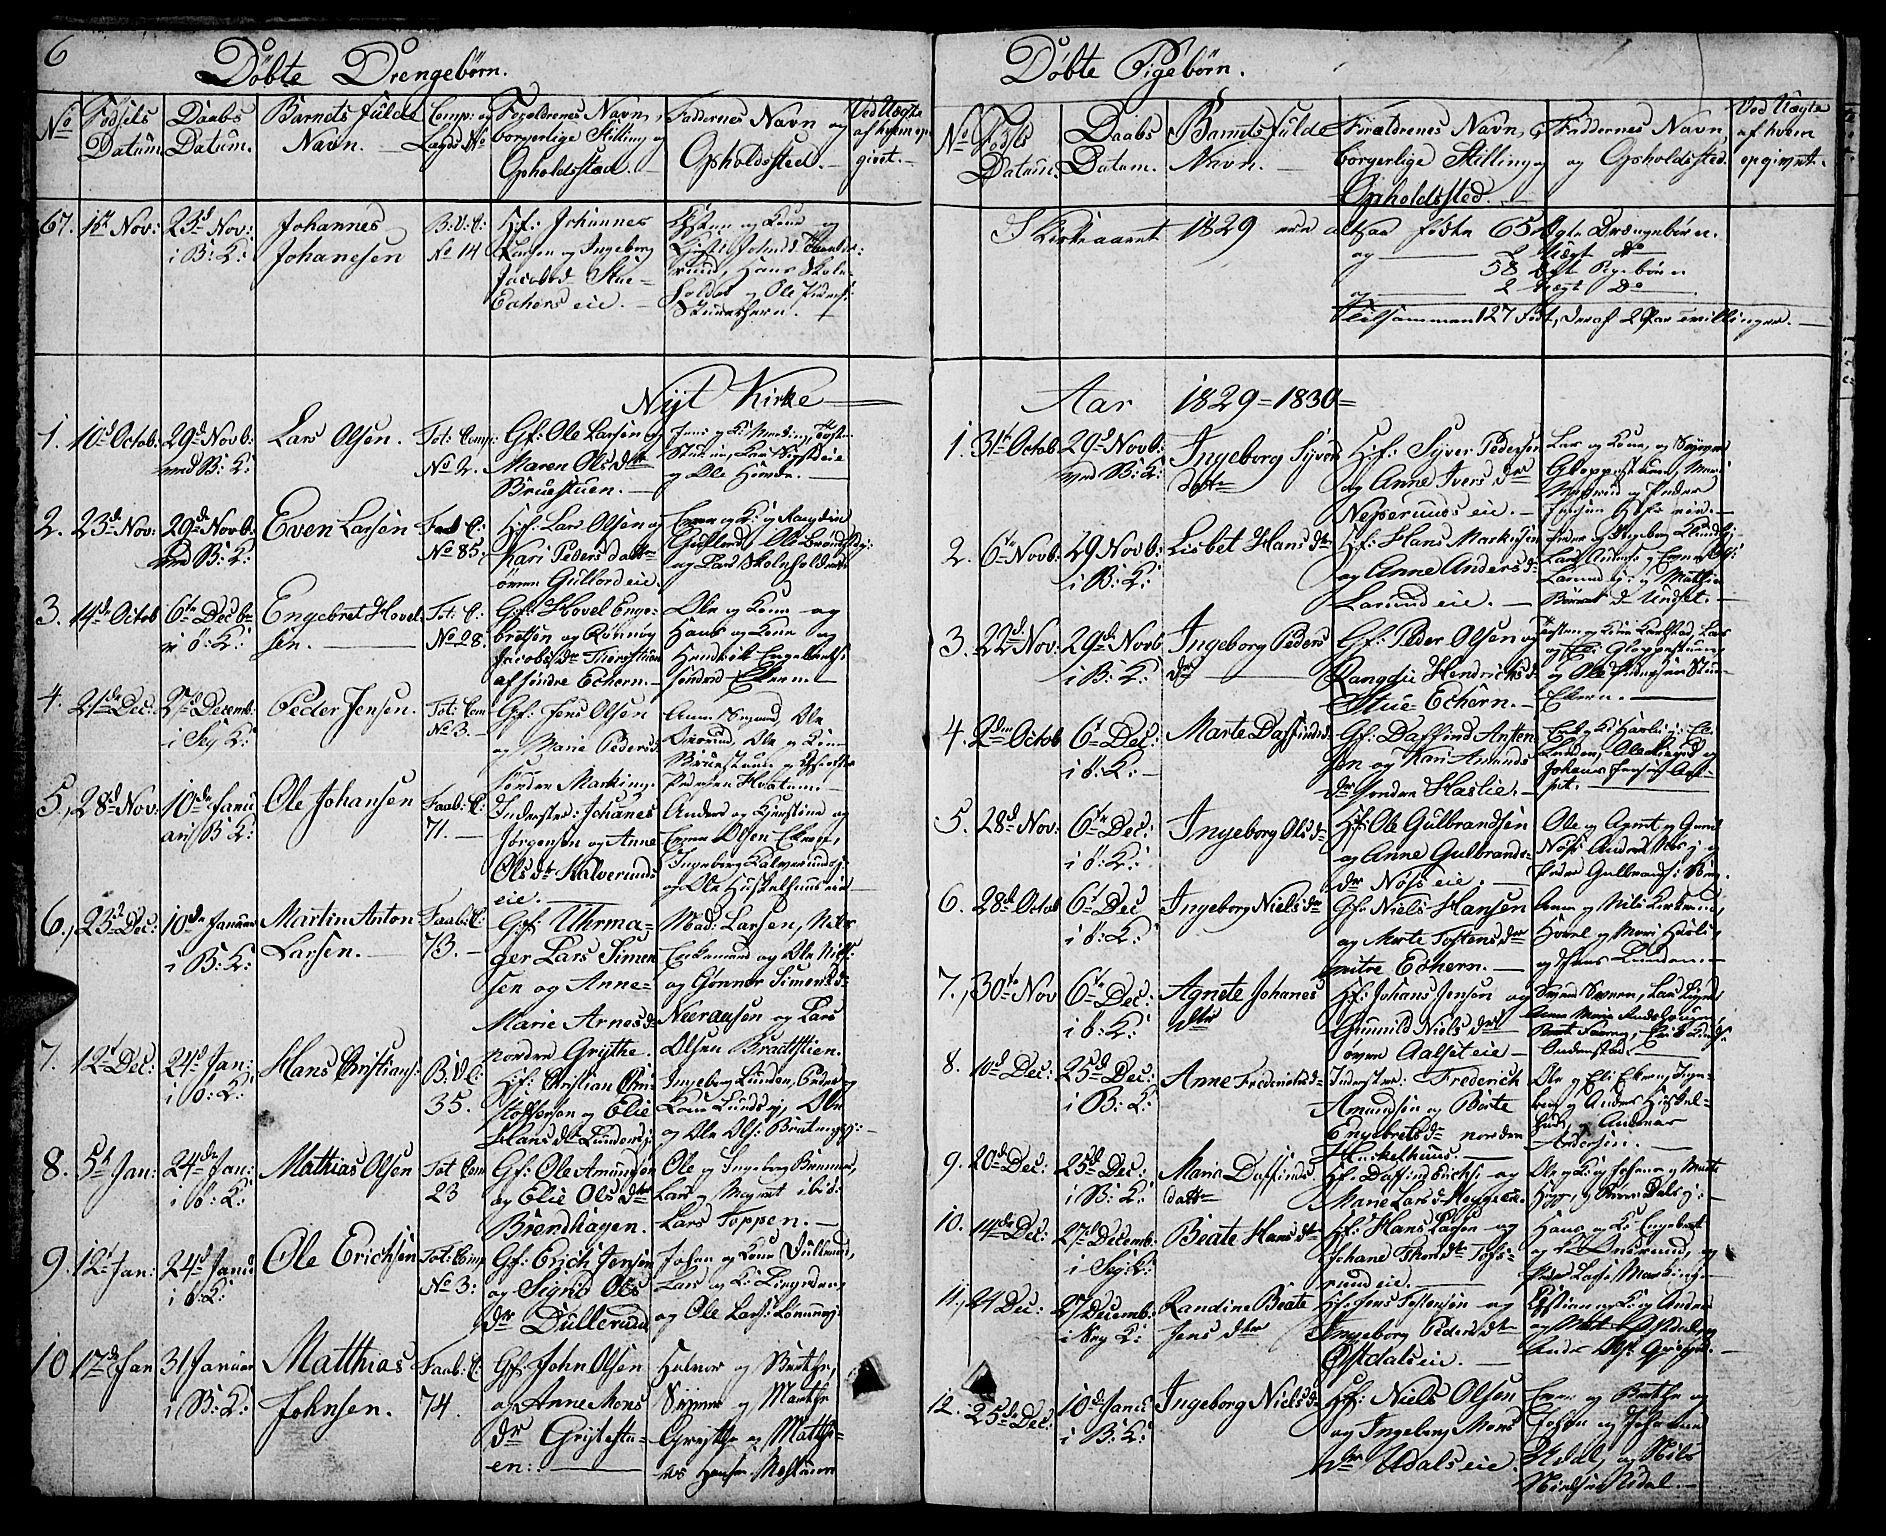 SAH, Biri prestekontor, Klokkerbok nr. 2, 1828-1842, s. 6